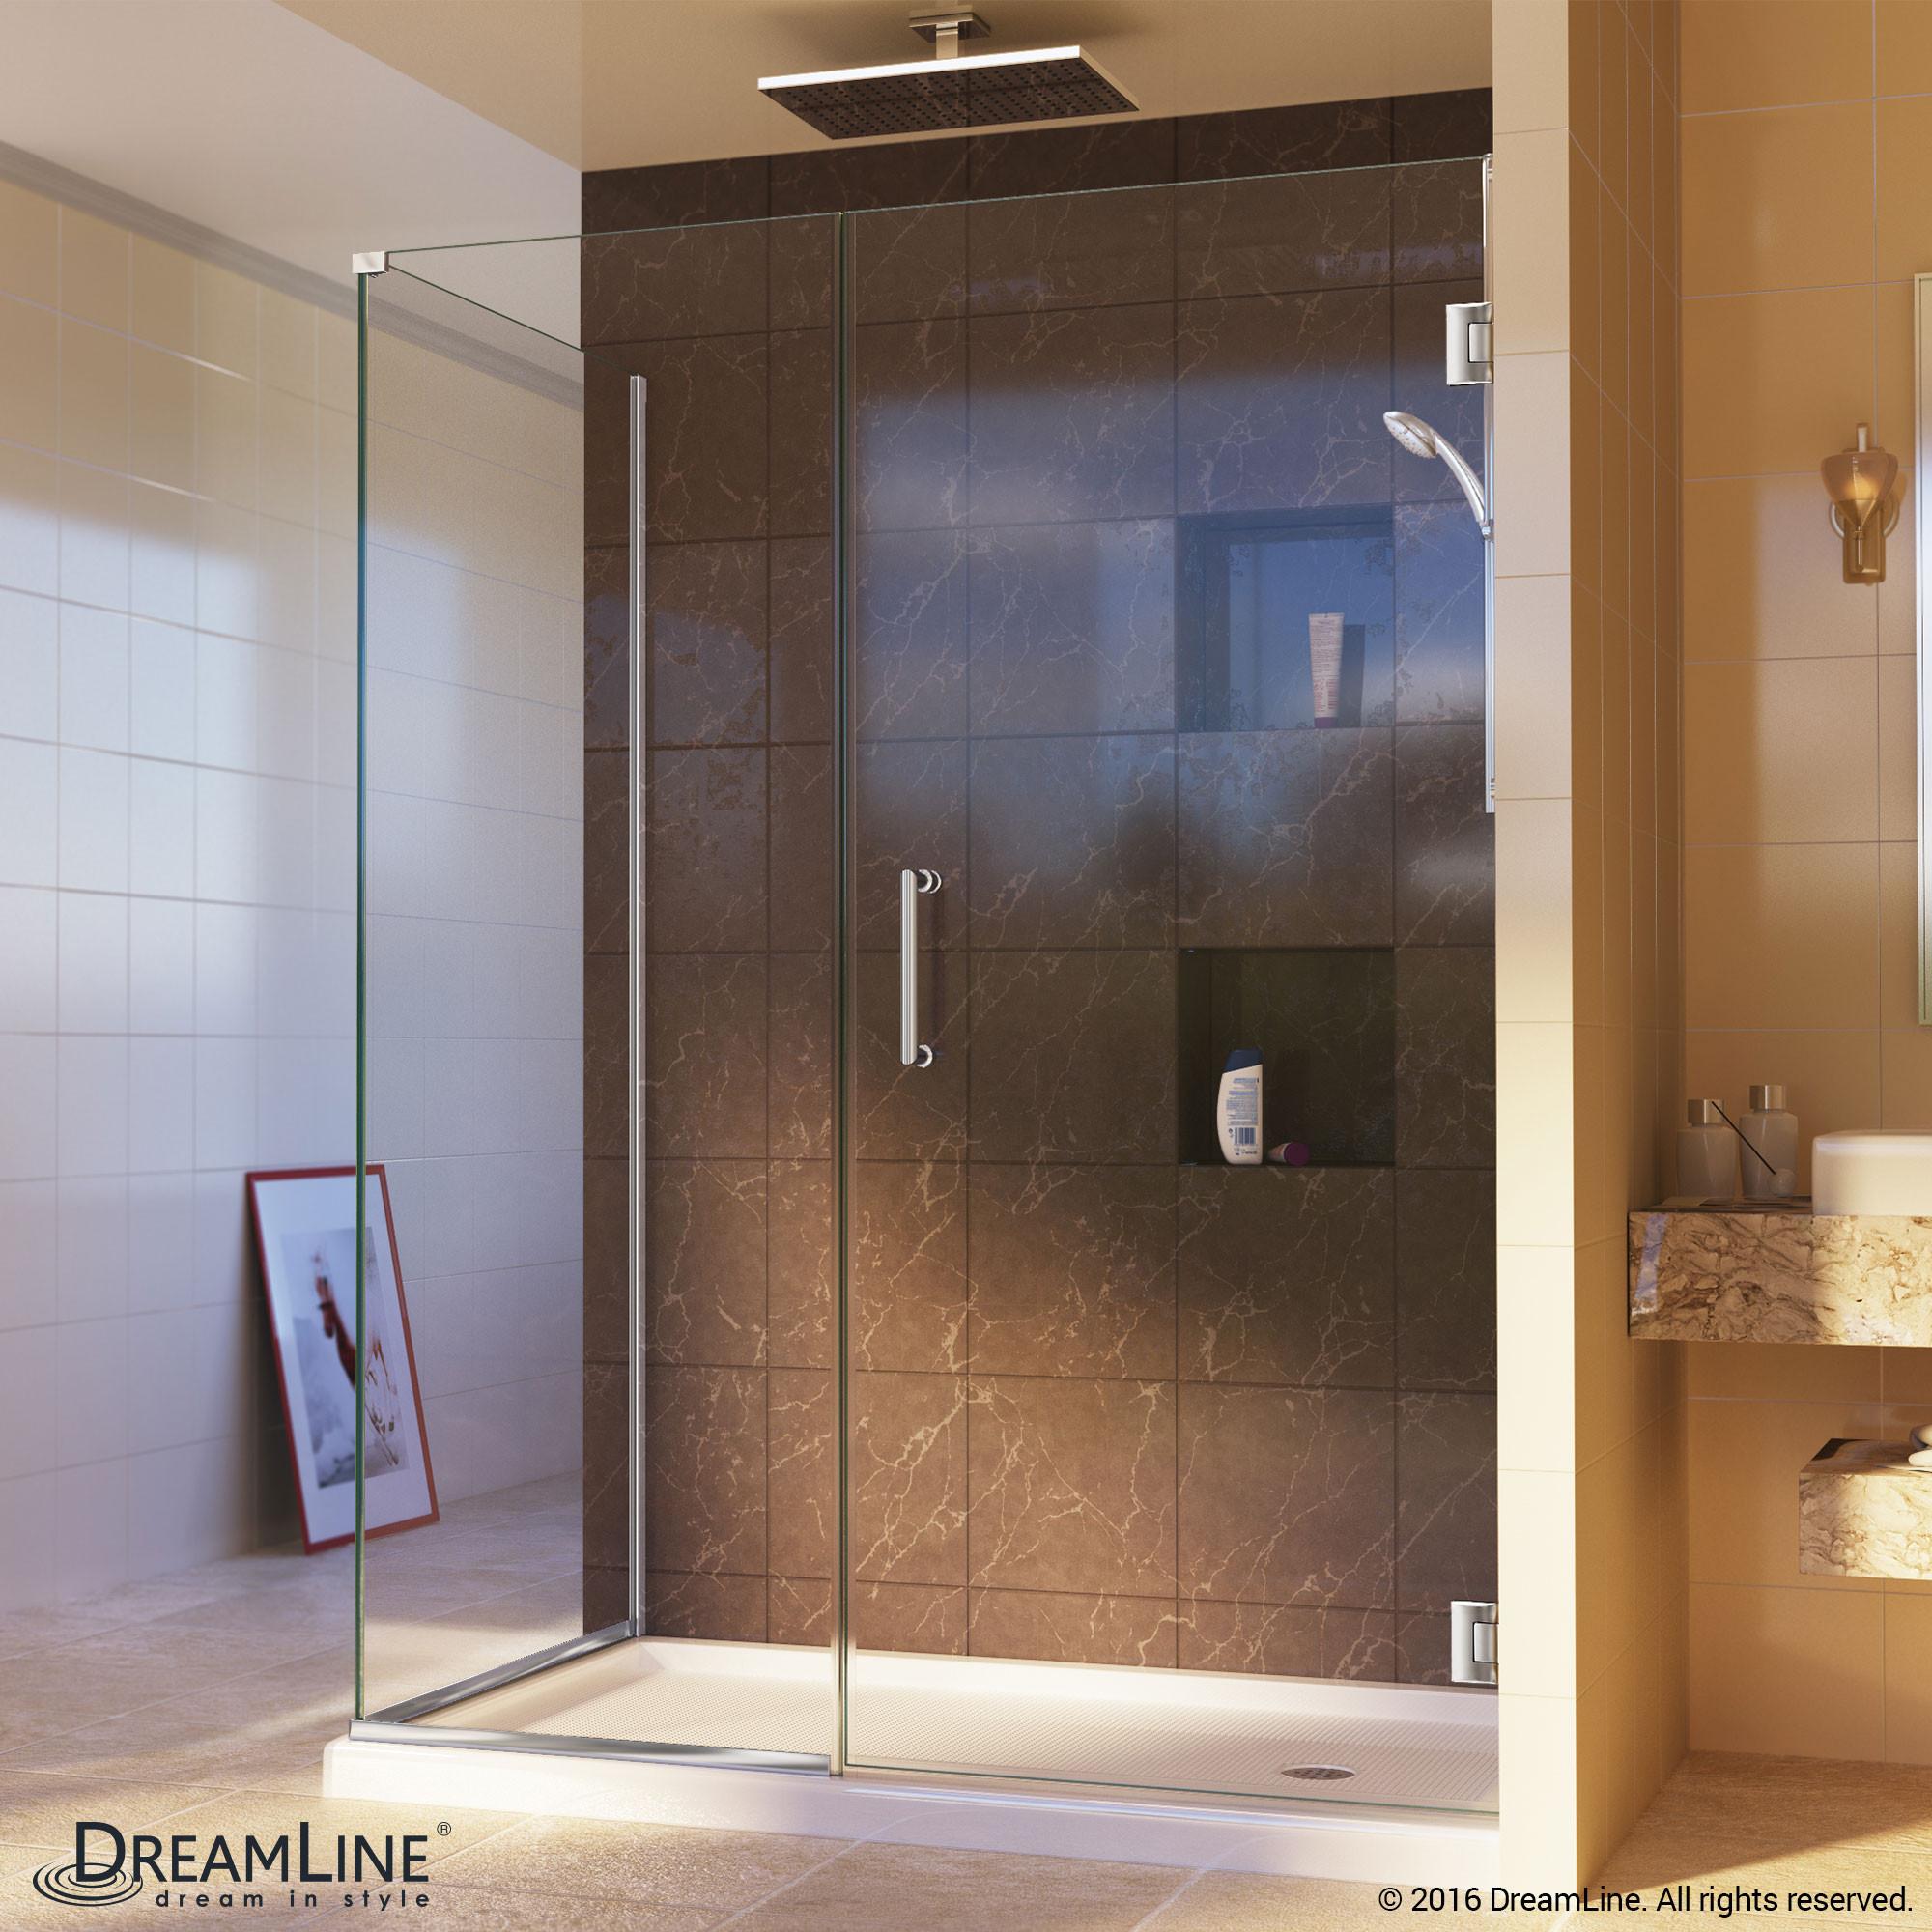 DreamLine SHEN-24505340-01 Unidoor Plus Hinged Shower Enclosure In Chrome Finish Hardware